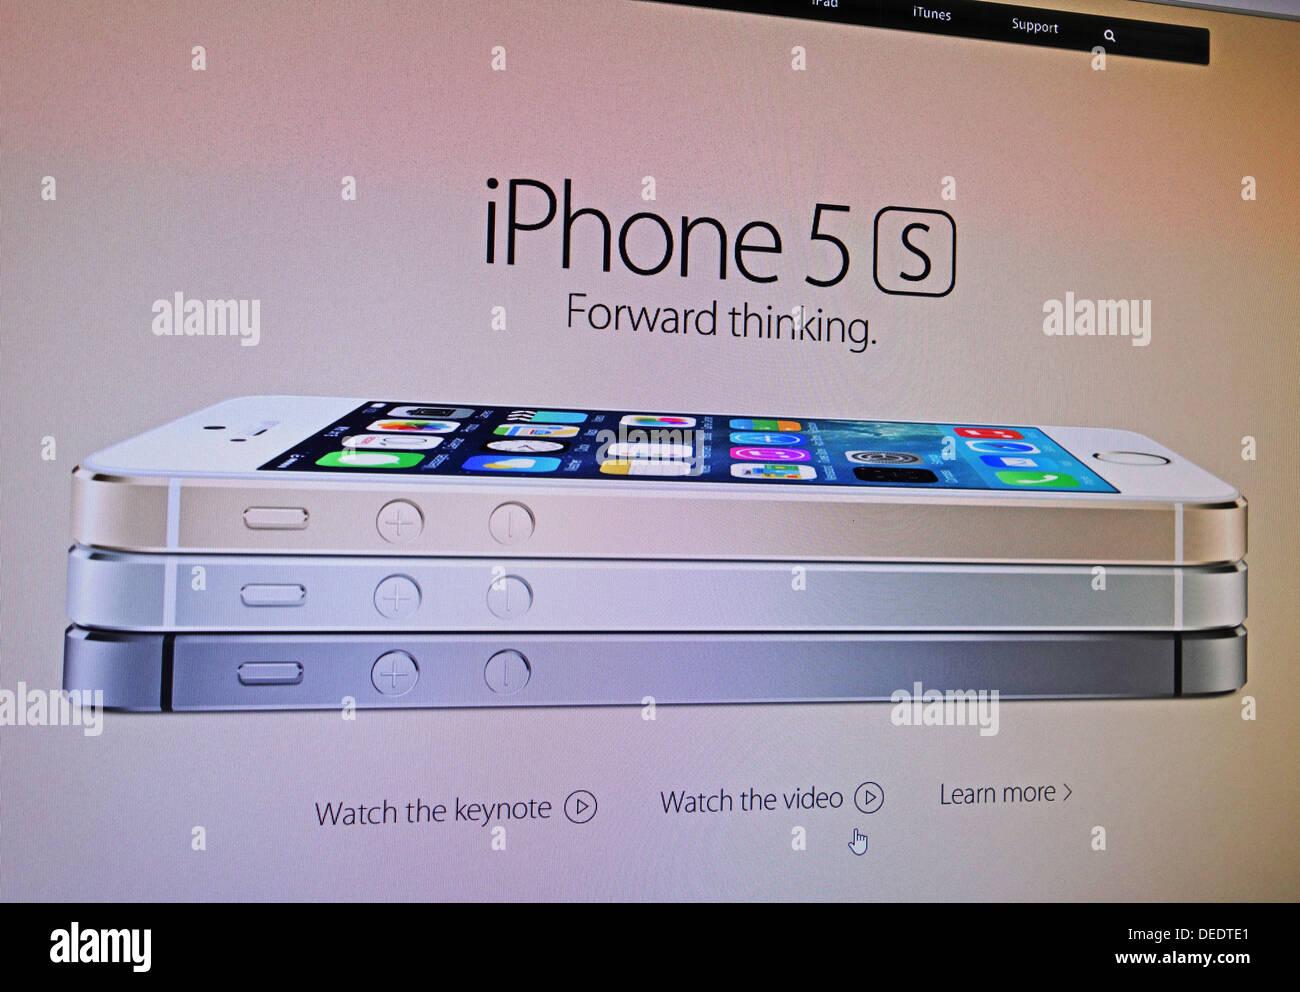 iPhone 5 s internet advert - Stock Image